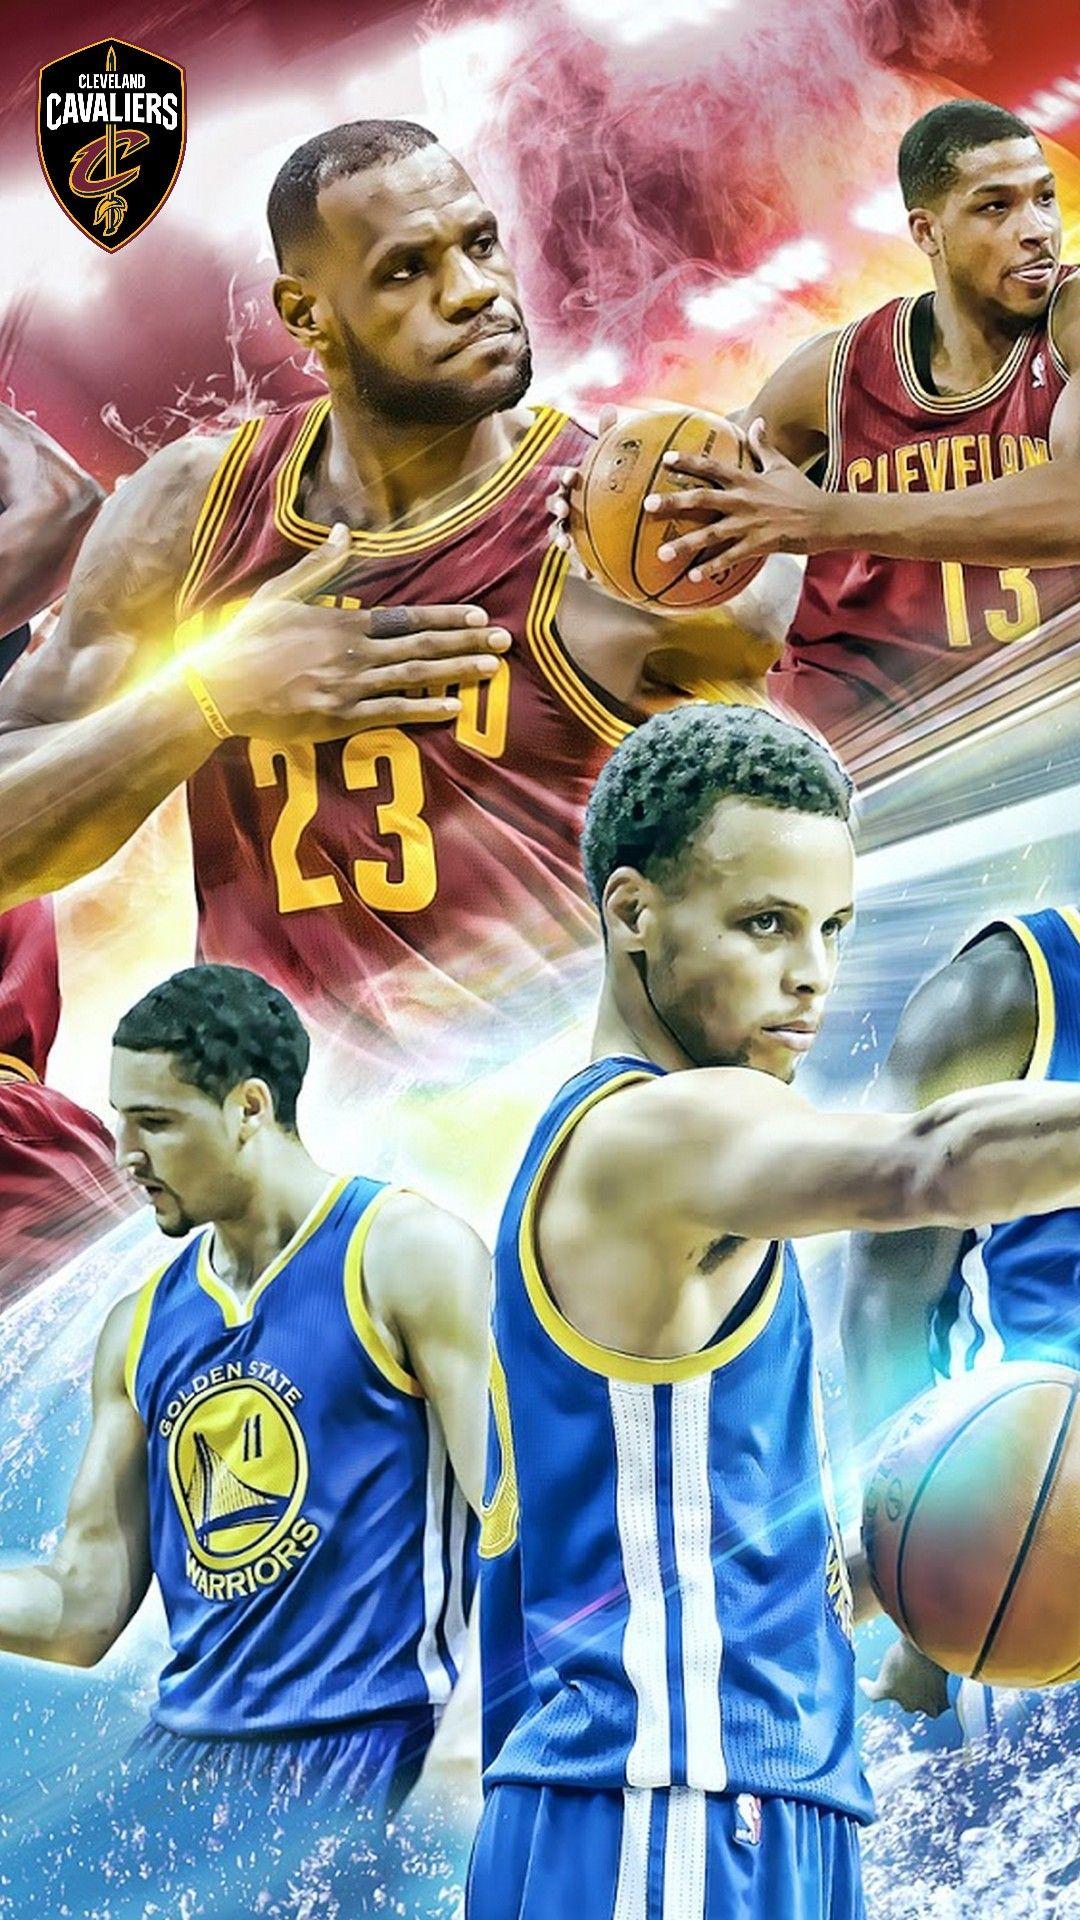 Mobile Wallpaper Hd Cleveland Cavaliers Basketball Wallpaper Cleveland Cavaliers Basketball Cavaliers Nba